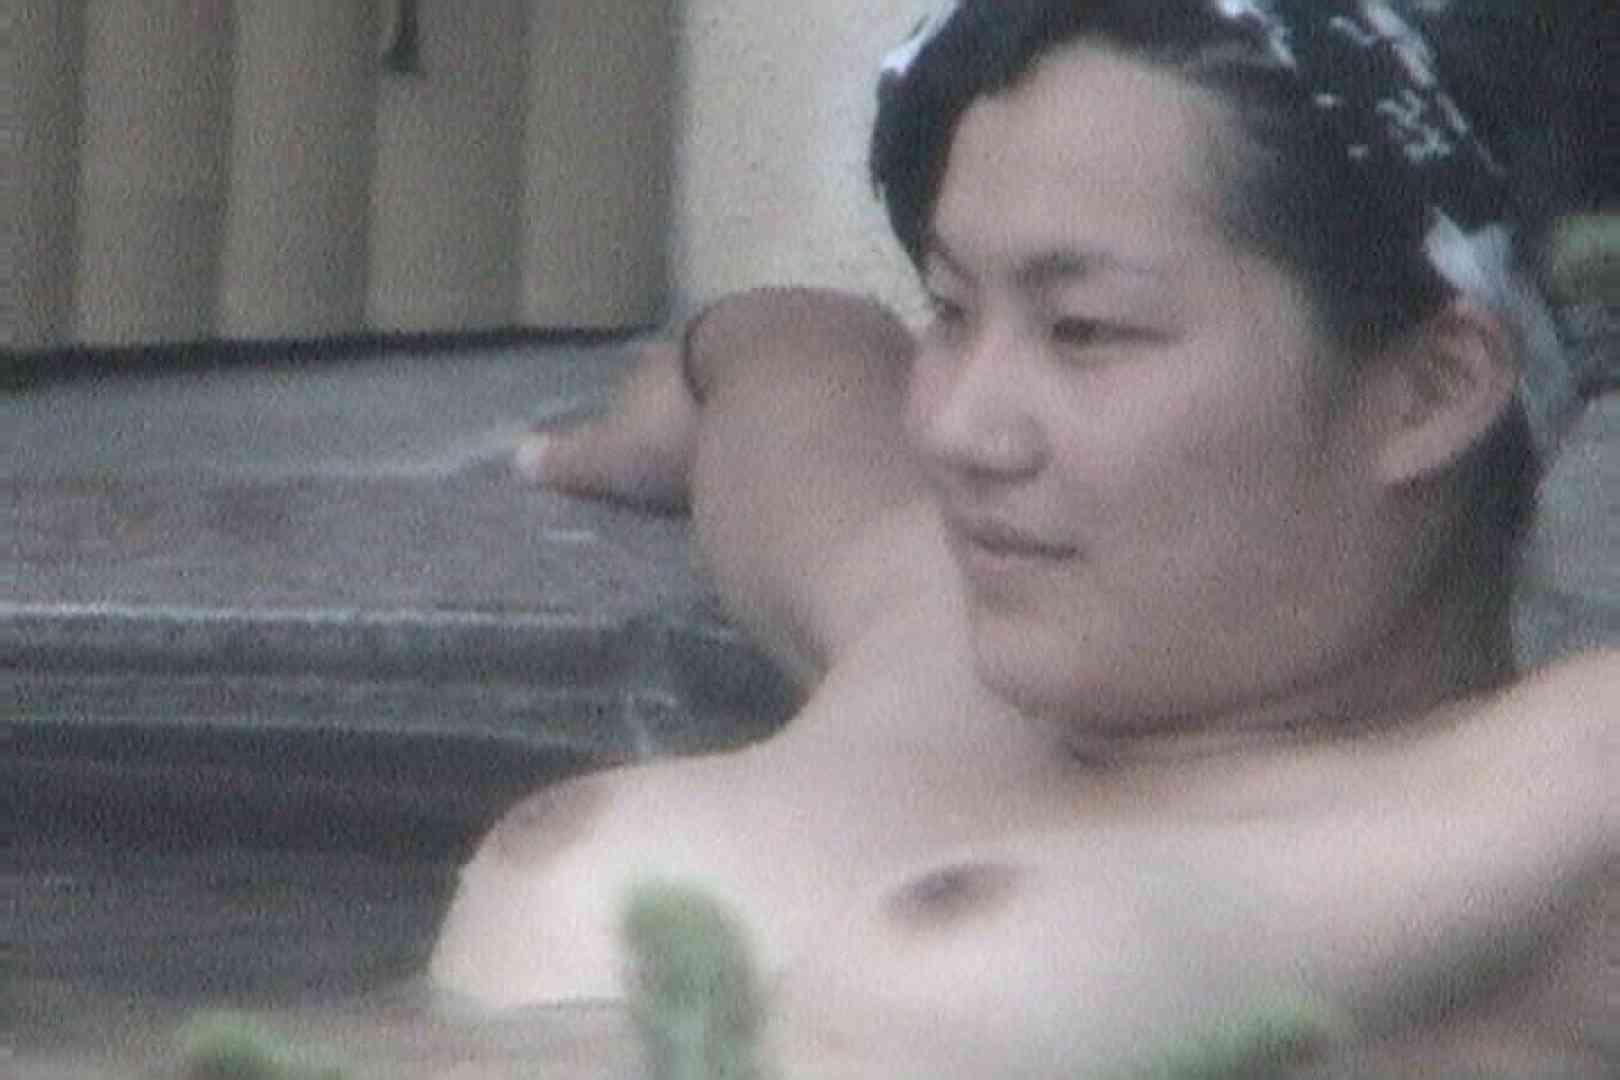 Aquaな露天風呂Vol.103 0  71連発 5